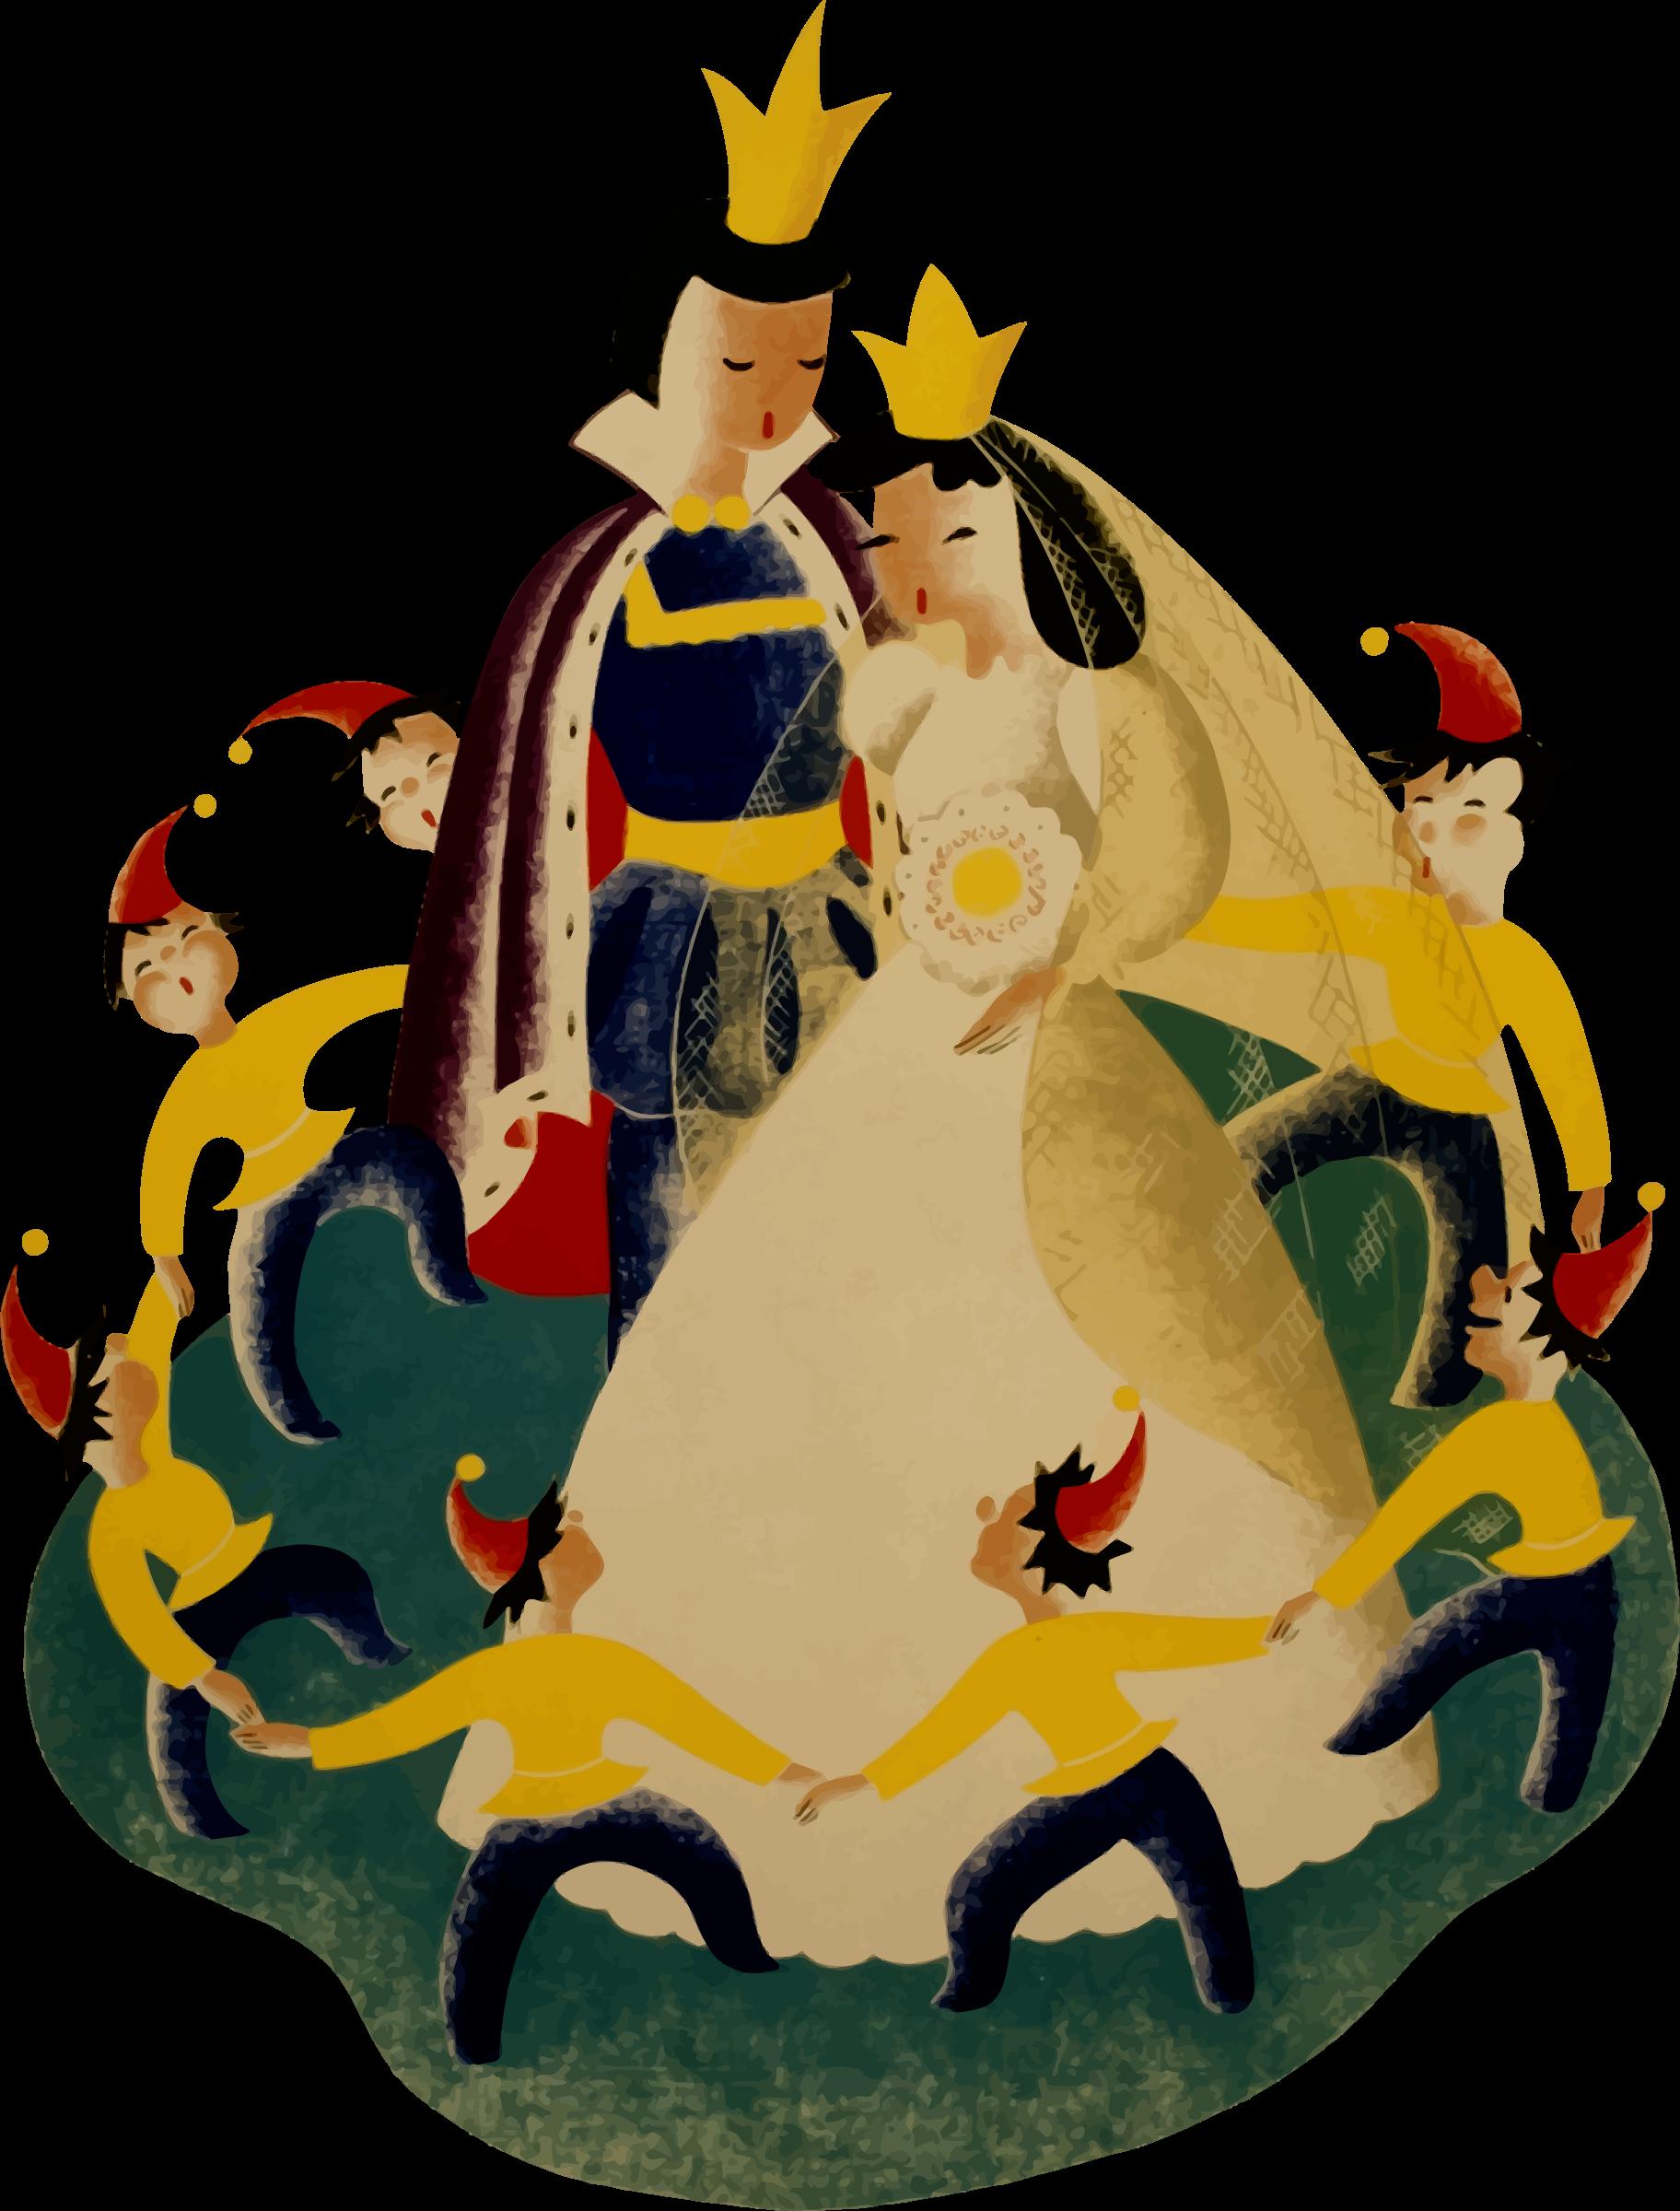 royal wedding vector clipart image free stock photo